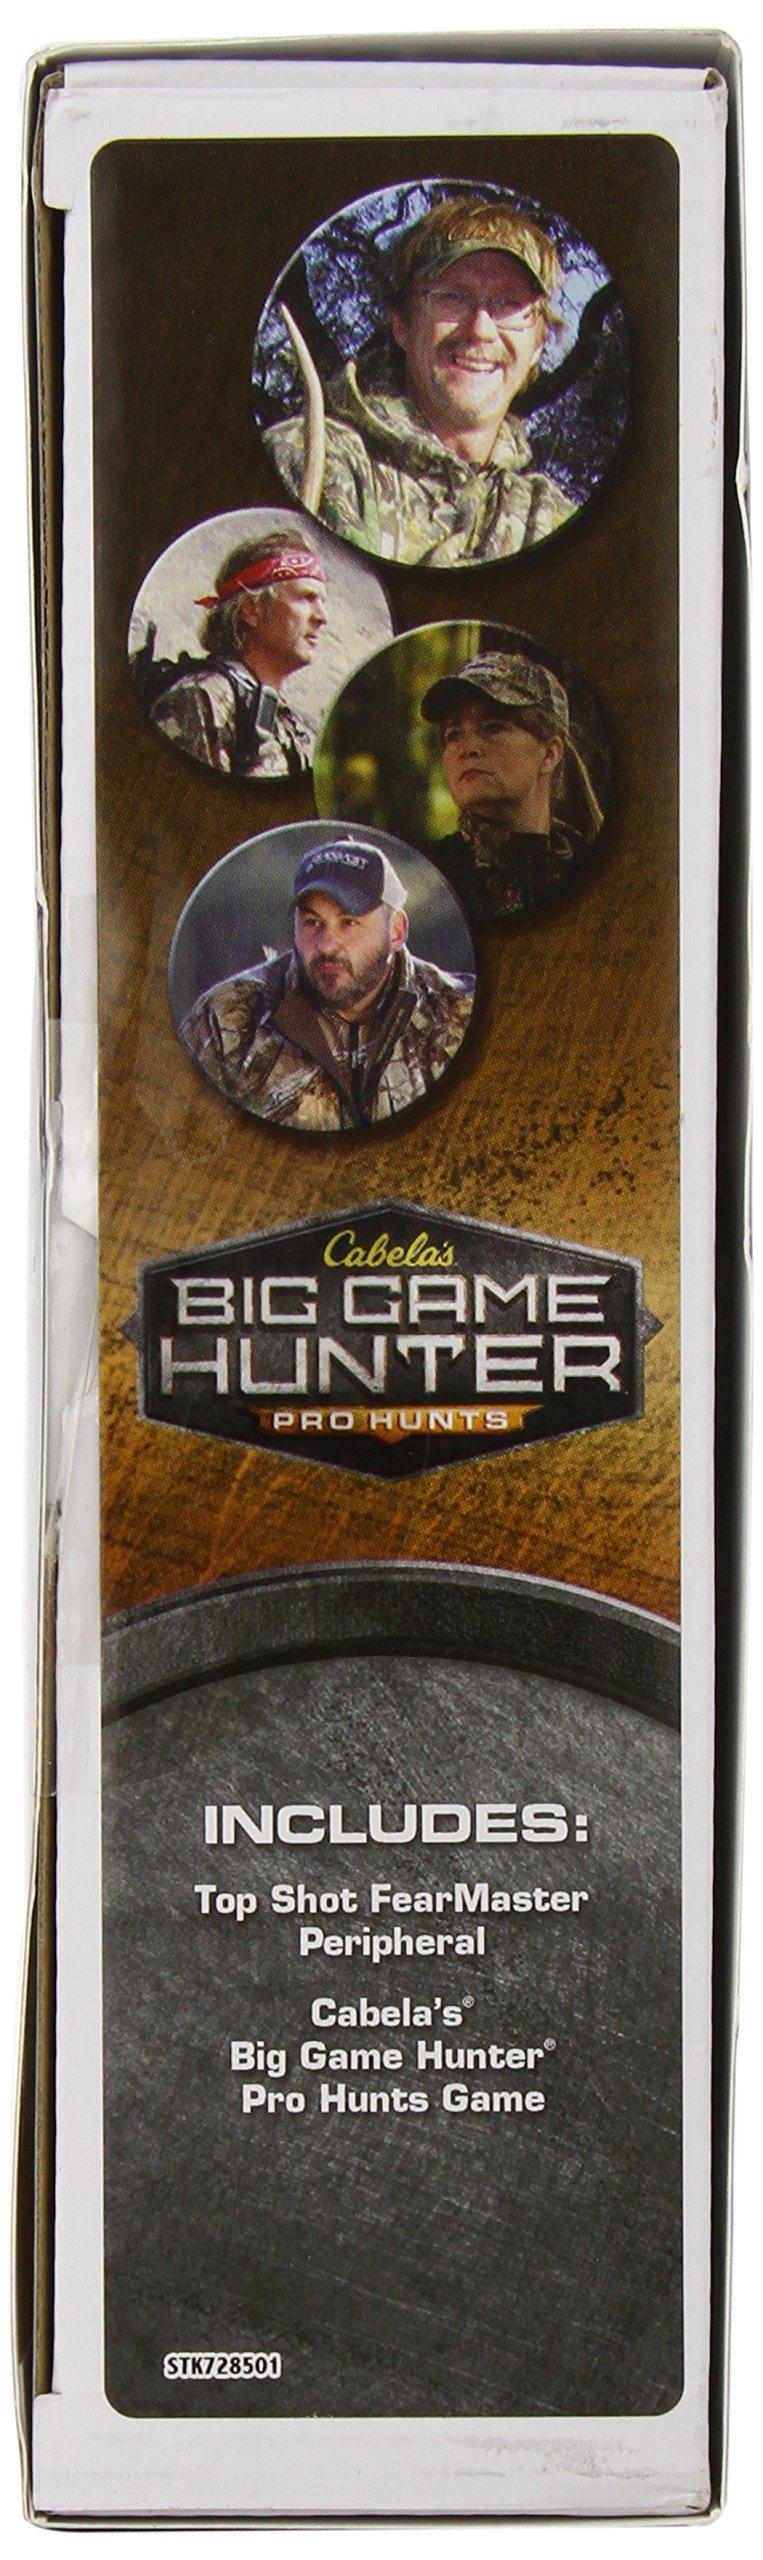 Cabela's: Big Game Hunter Pro Hunts with Gun - PlayStation 3 by Activision (Image #4)